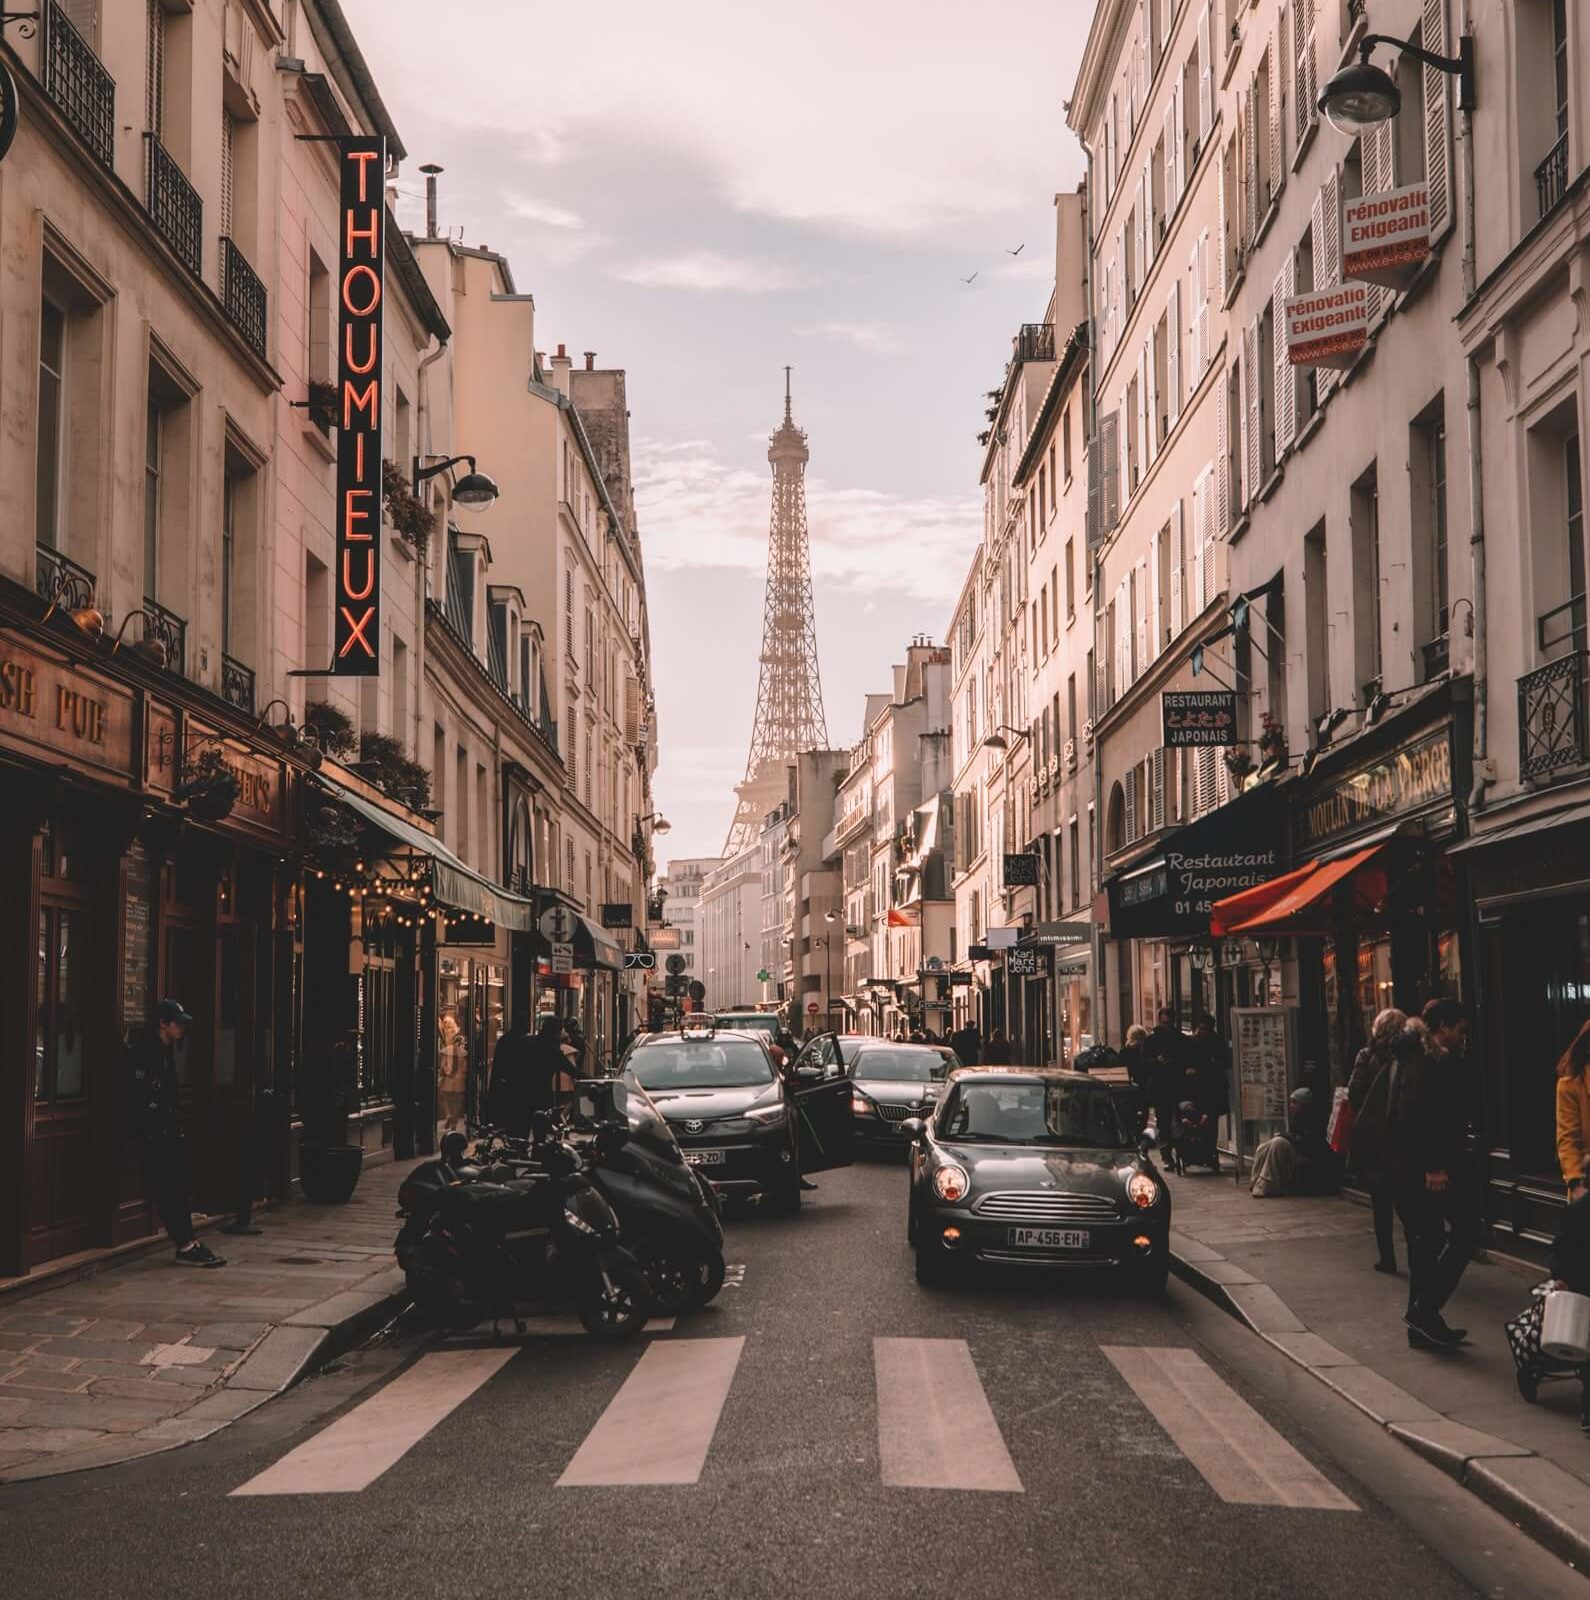 streets of the Marais neighborhood in Paris